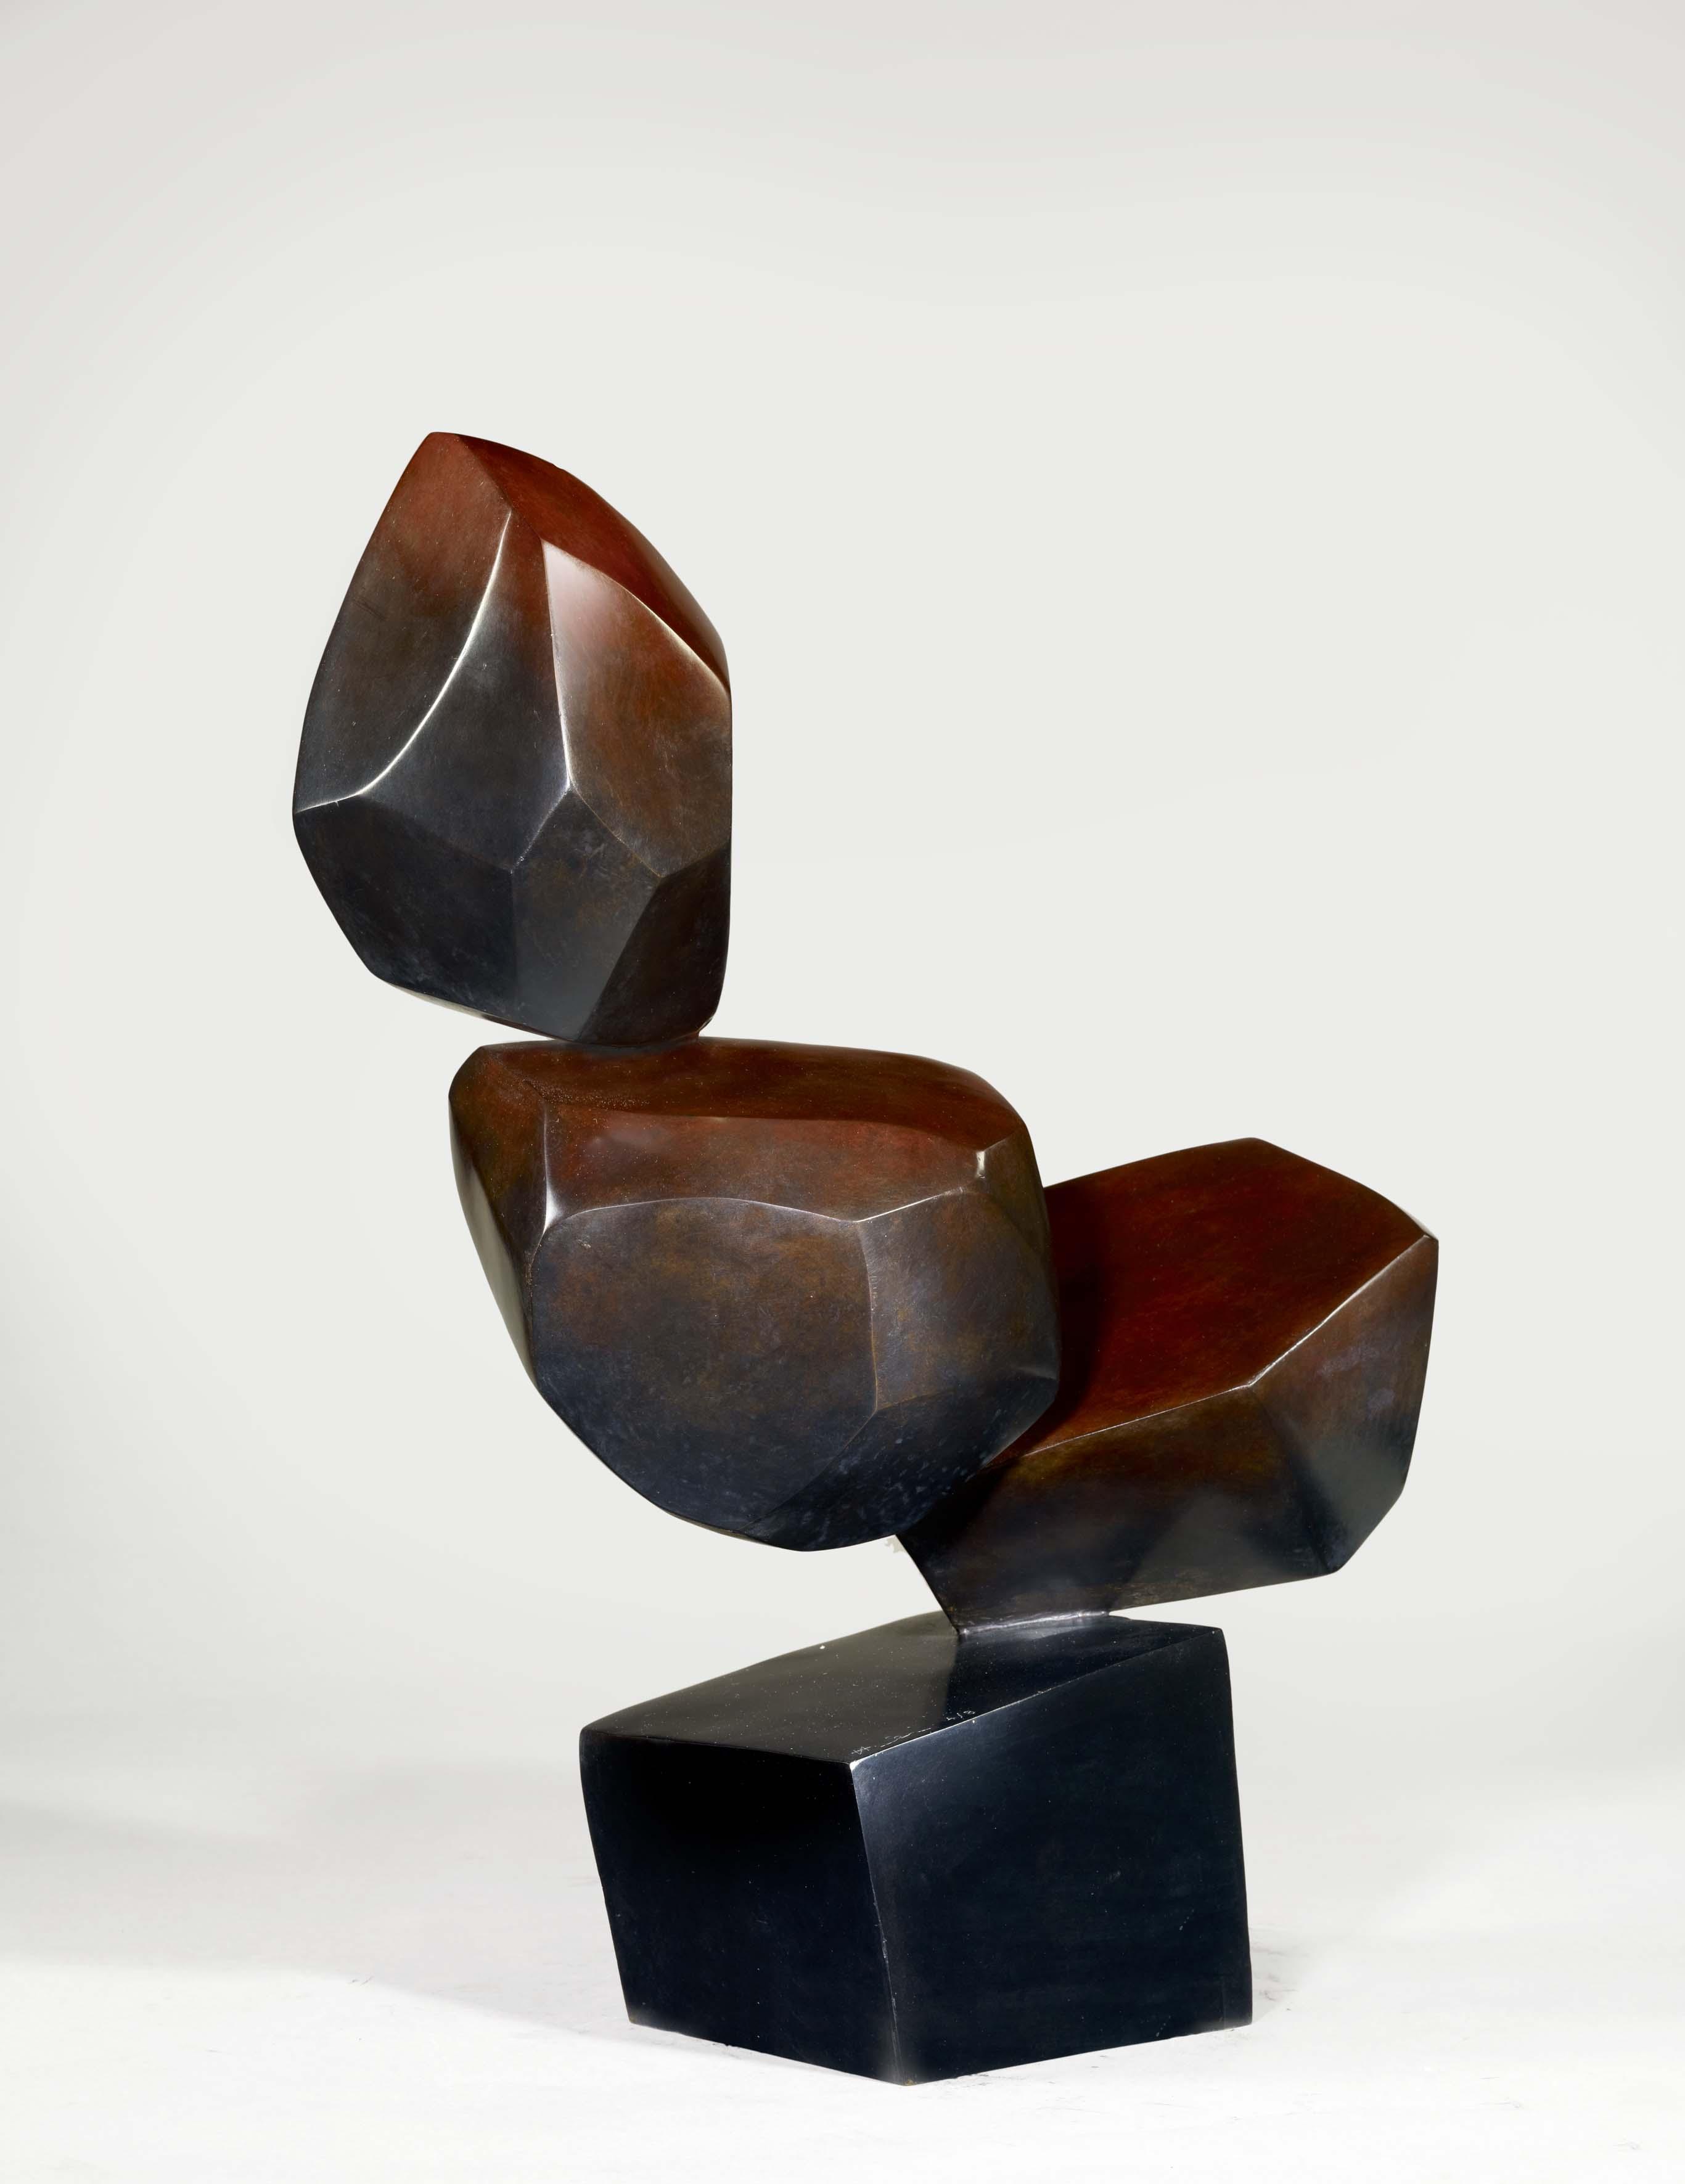 Rocher, 1996, 59 x 46 x 20 cm